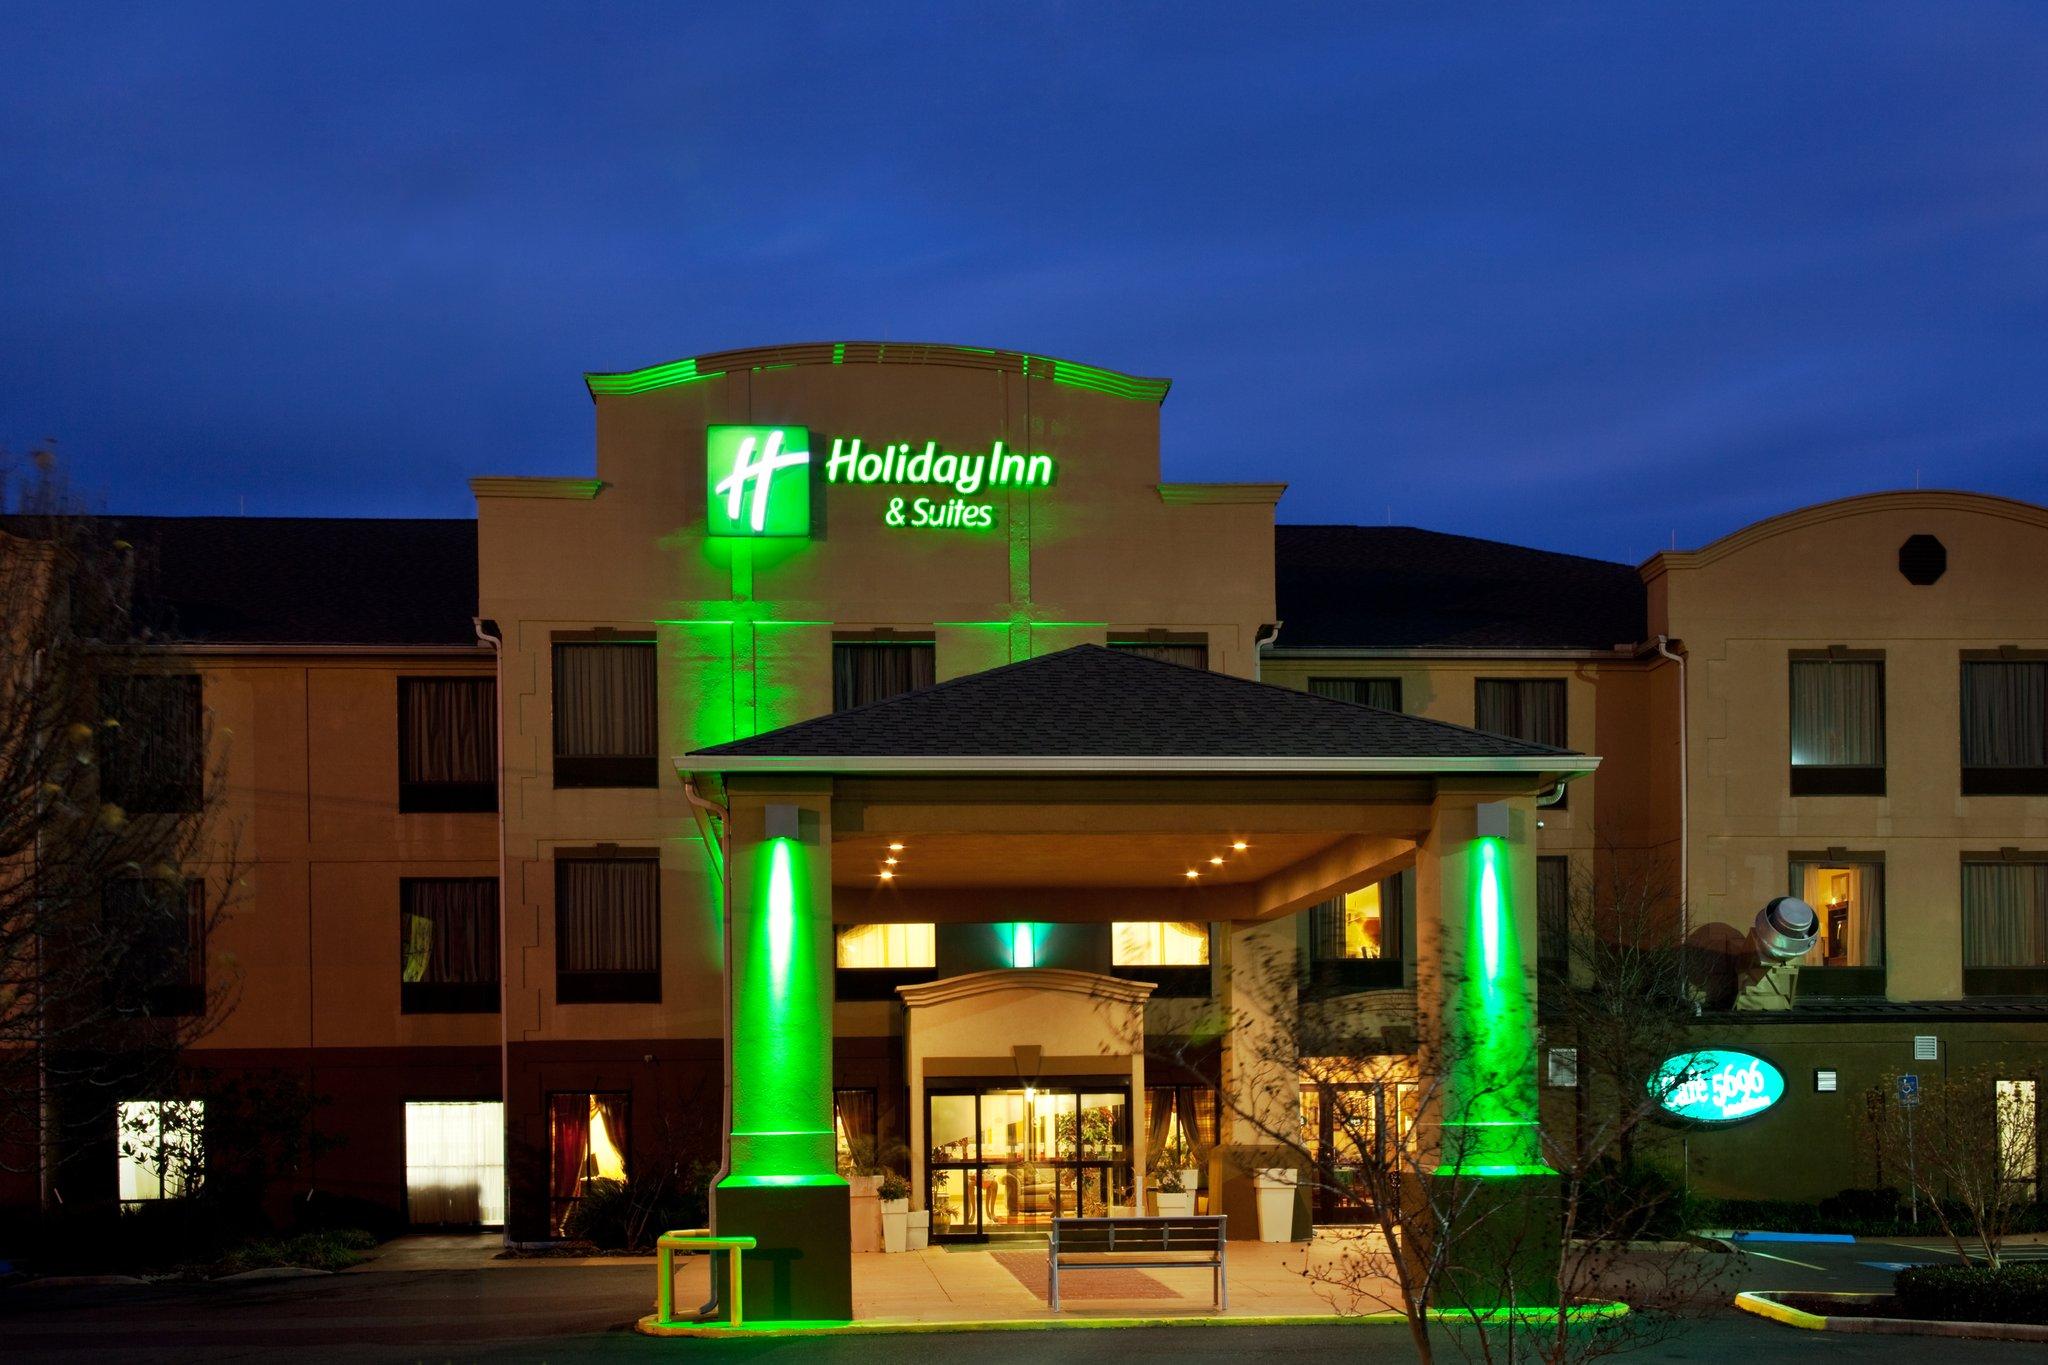 Holiday Inn & Suites OPELOUSAS